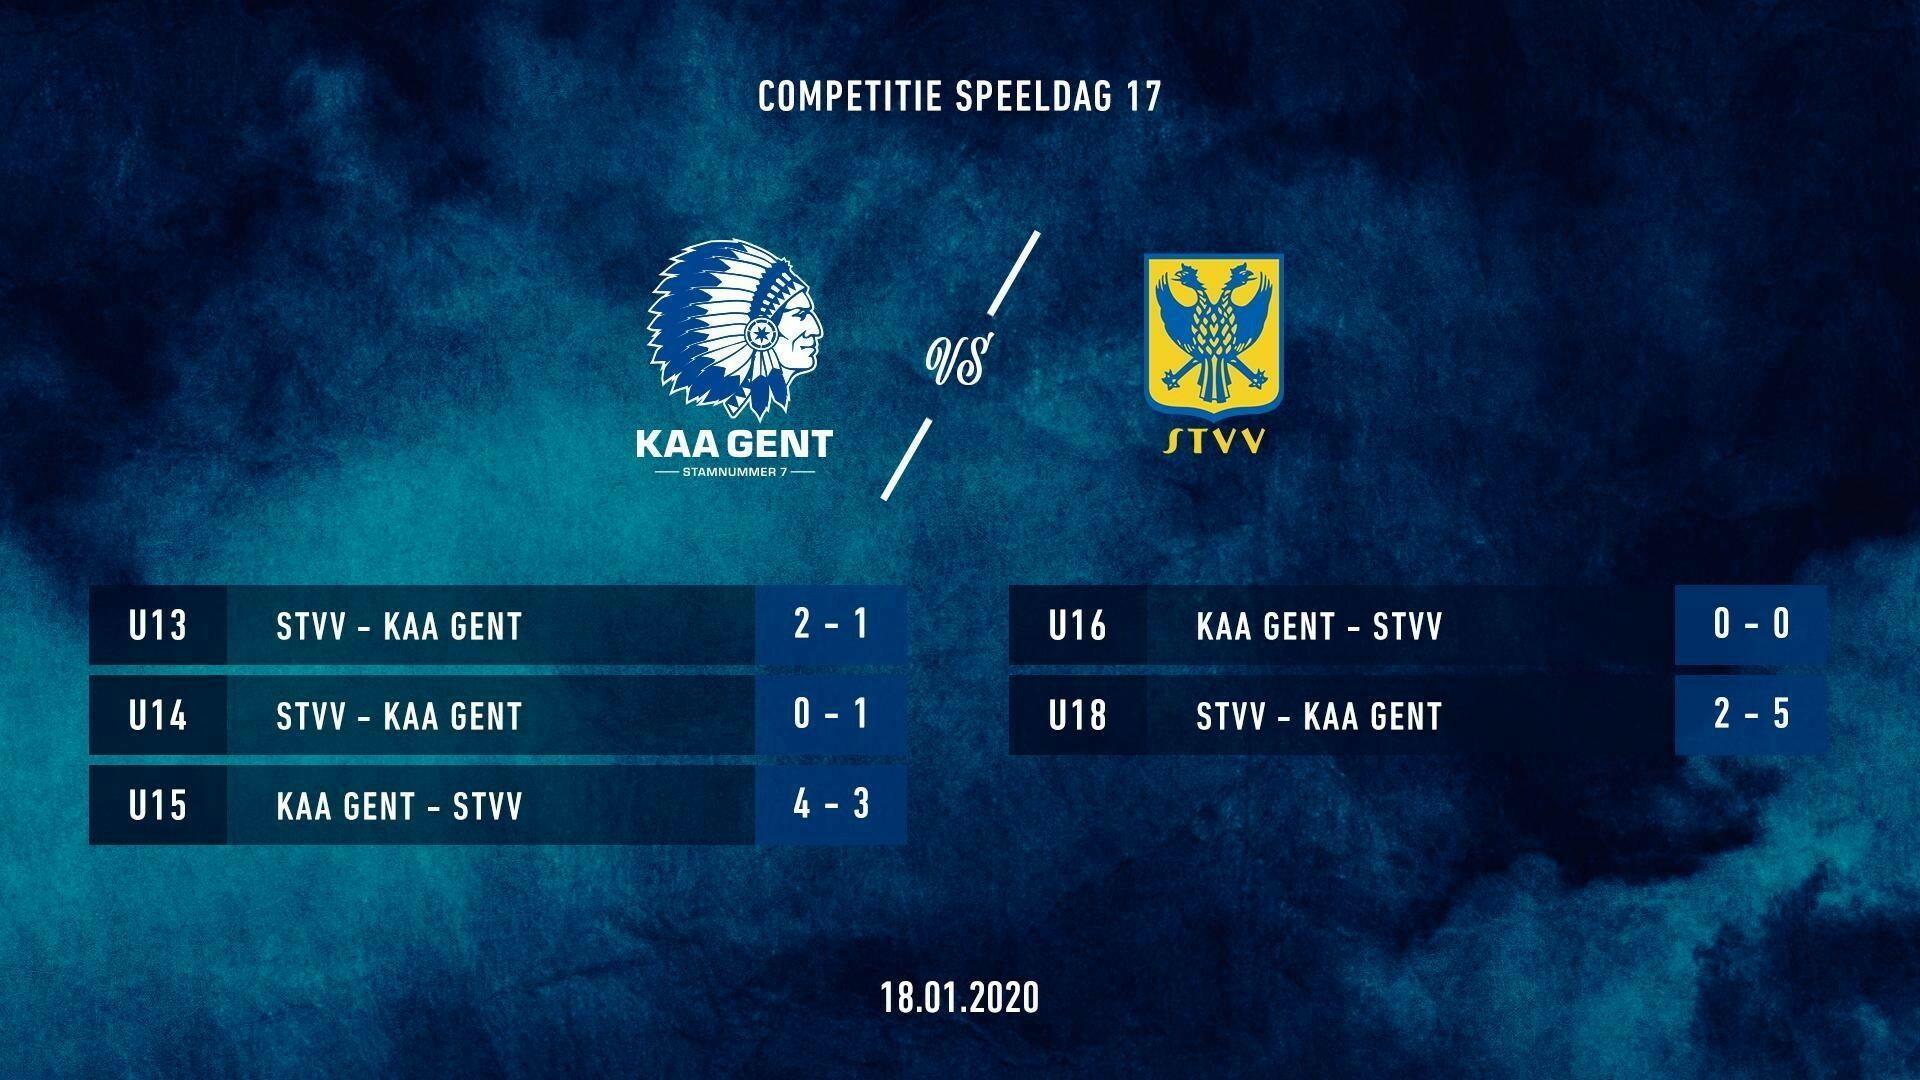 Jeugd: uitslagen KAA Gent - STVV